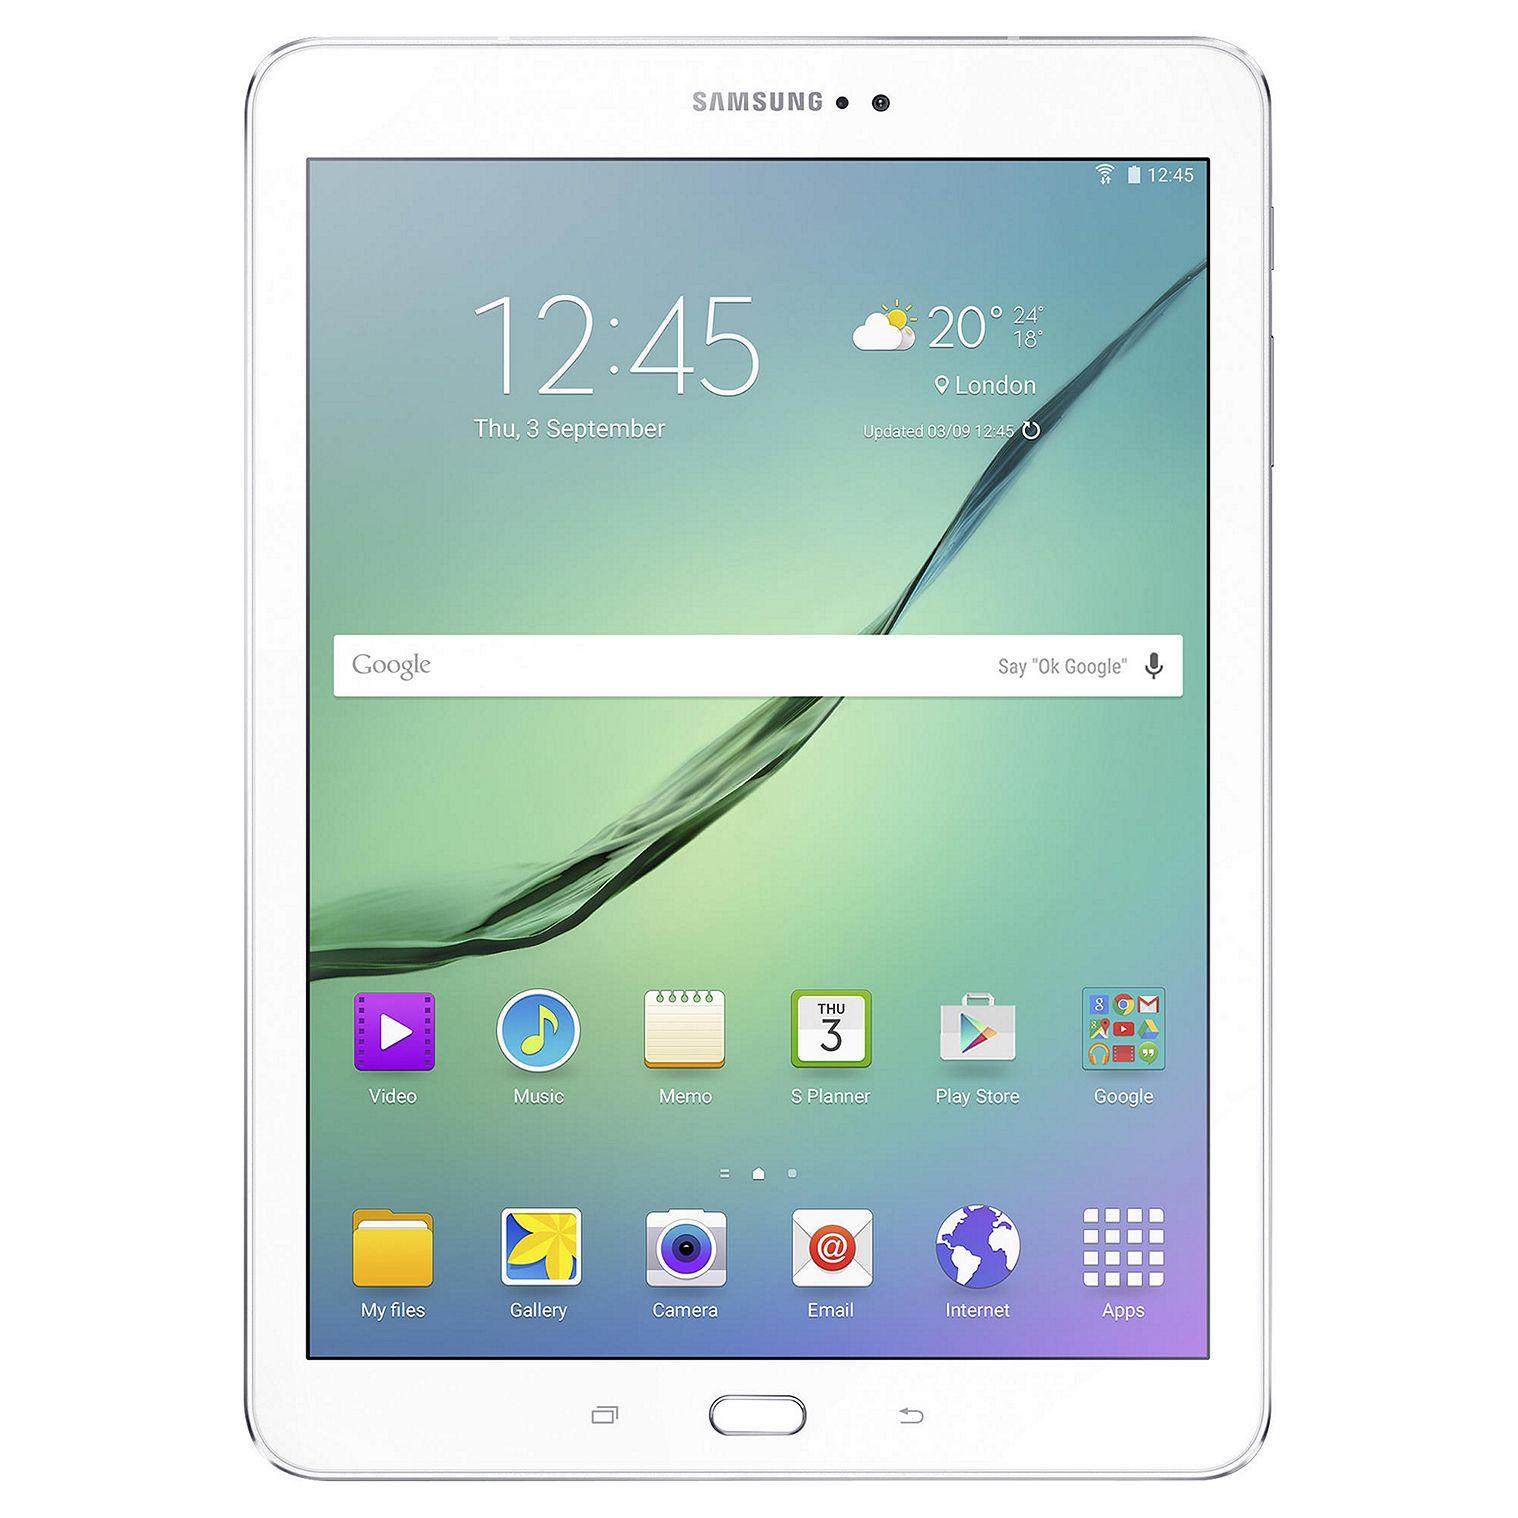 Samsung Galaxy Tab S 2 9.7 WiFi 32GB VE White & Black Variants in Stock! £279 @ Tesco